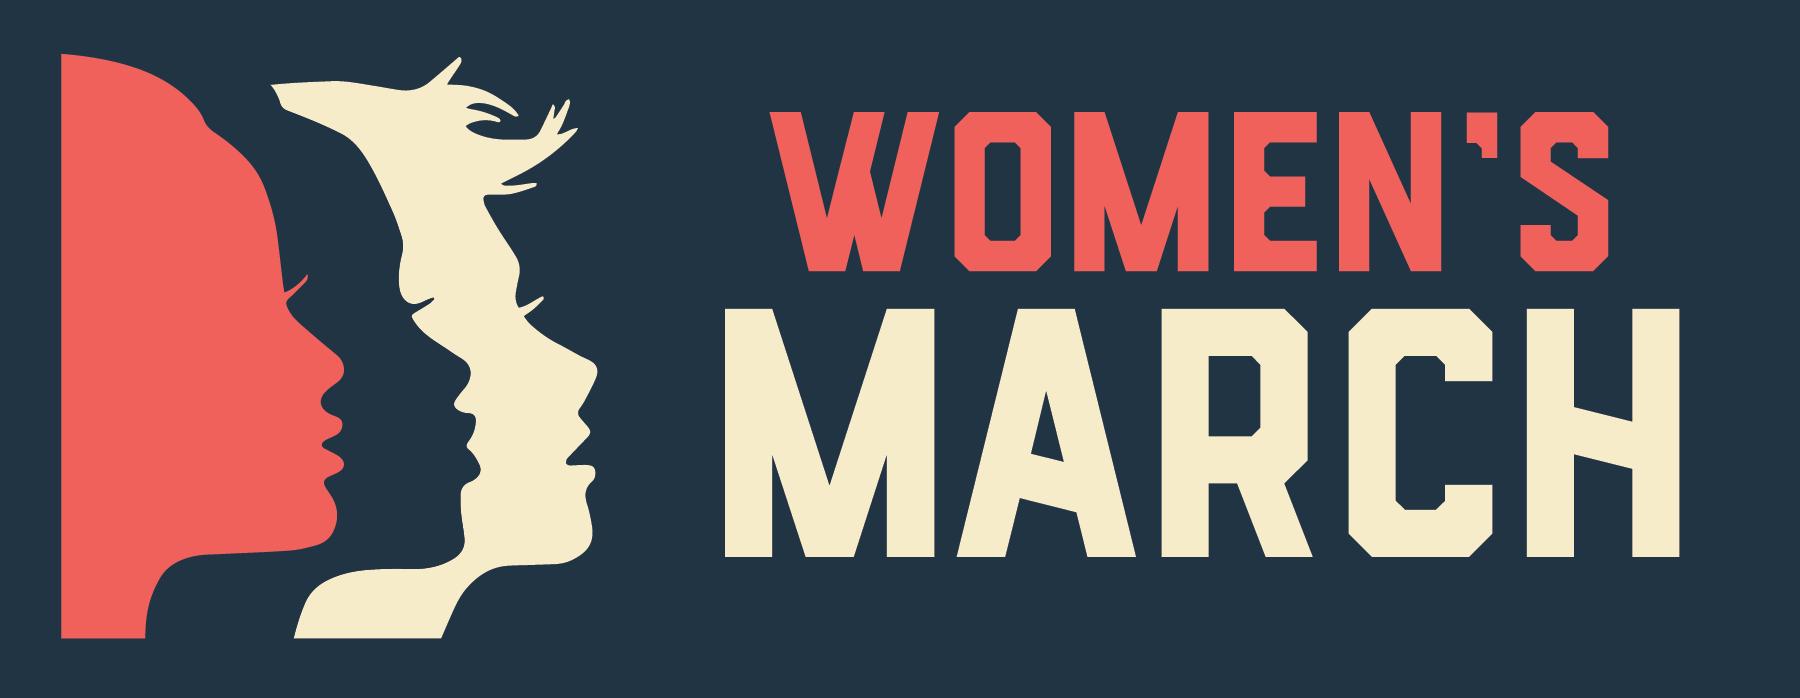 WomensMarchLogo.png